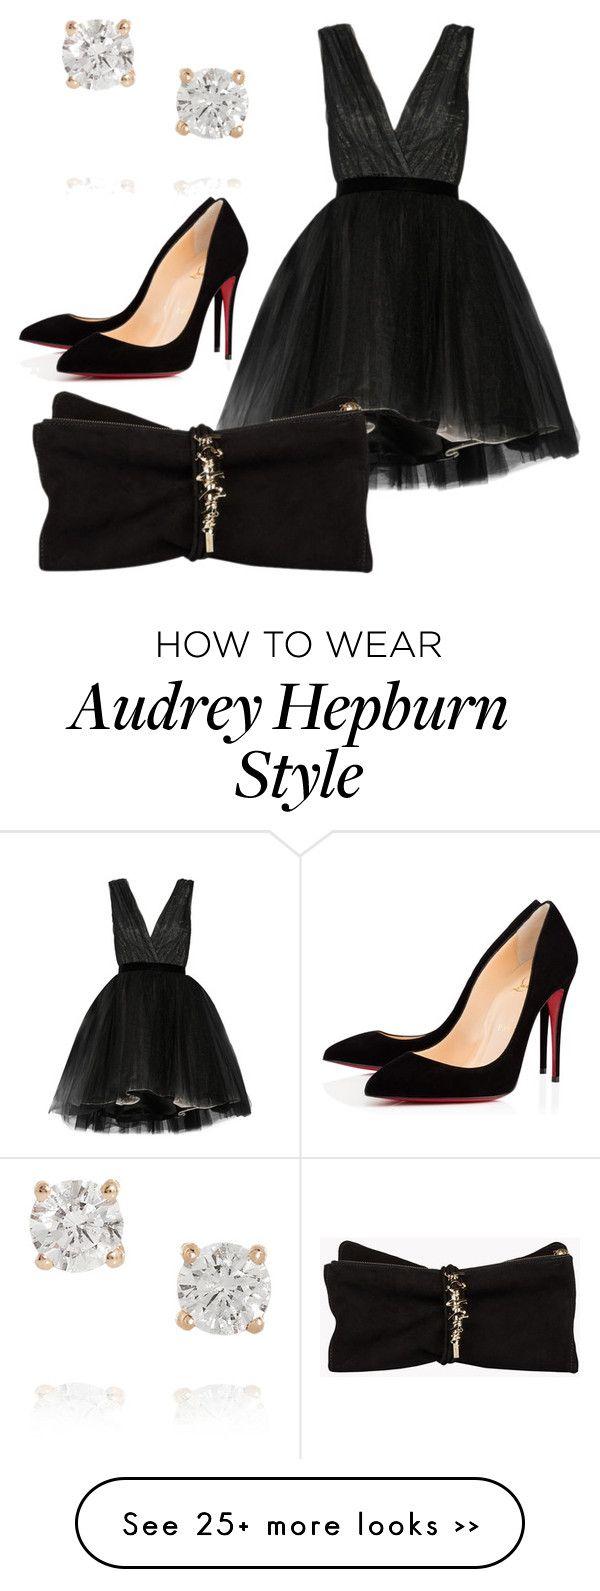 """Audrey Hepburn Style"" by jobethbhatia on Polyvore"